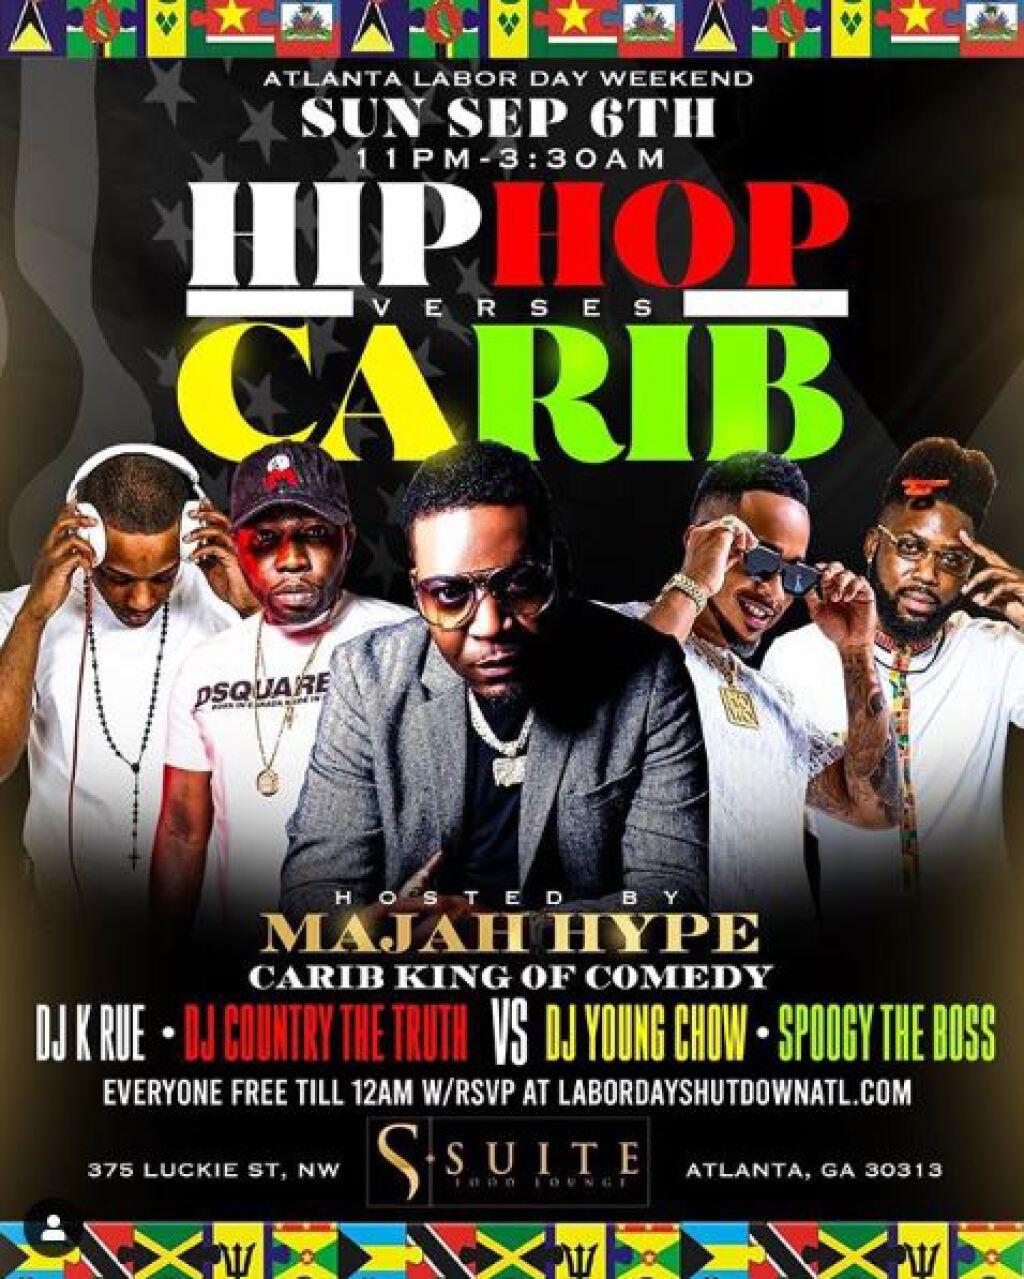 Hip Hop Vs Carib flyer or graphic.